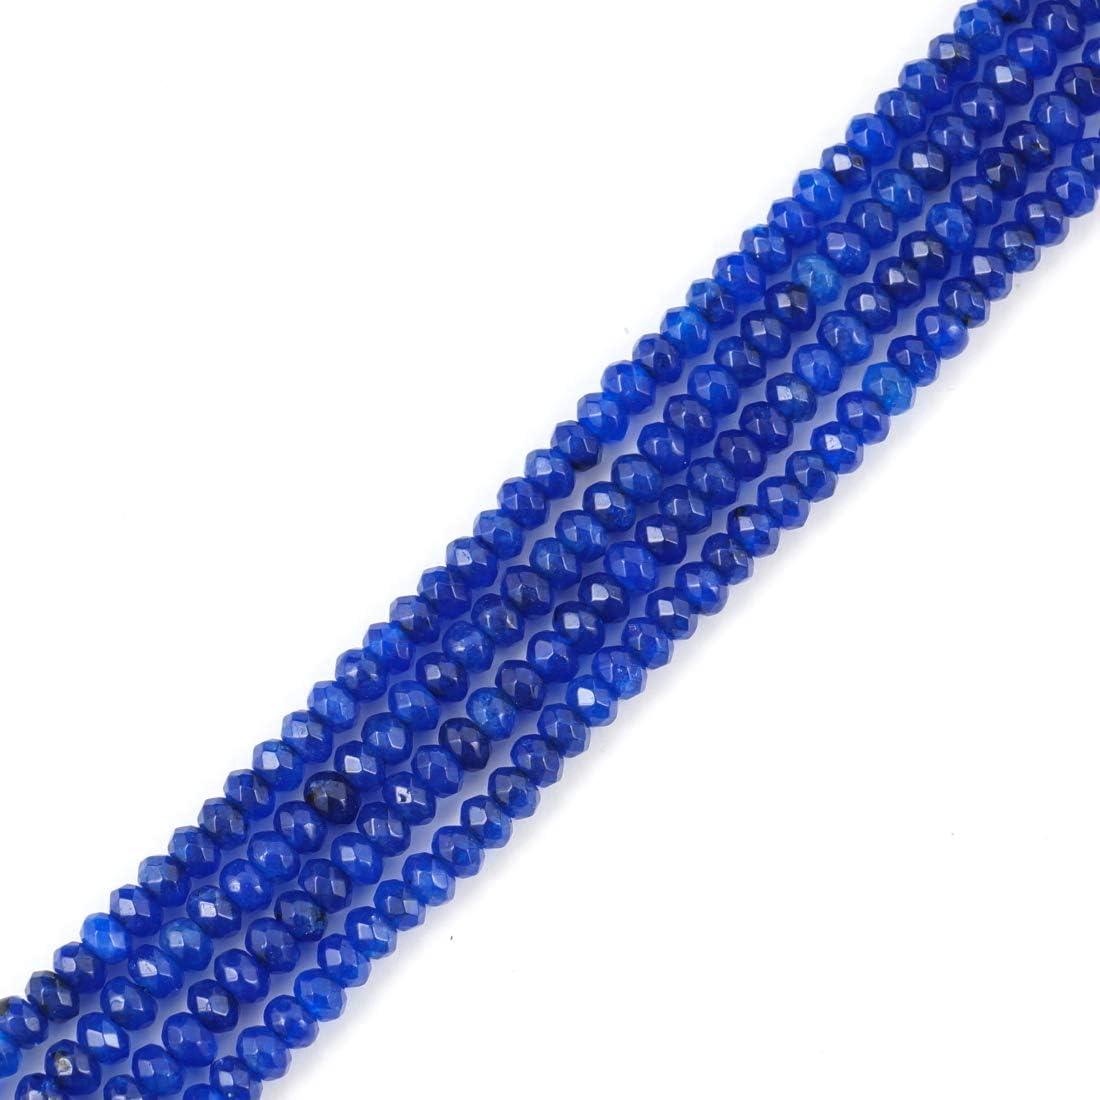 "3MM AZURA LAPIS LAZULI GEMSTONE GRADE A DARK BLUE ROUND 3MM LOOSE BEADS 16/"""